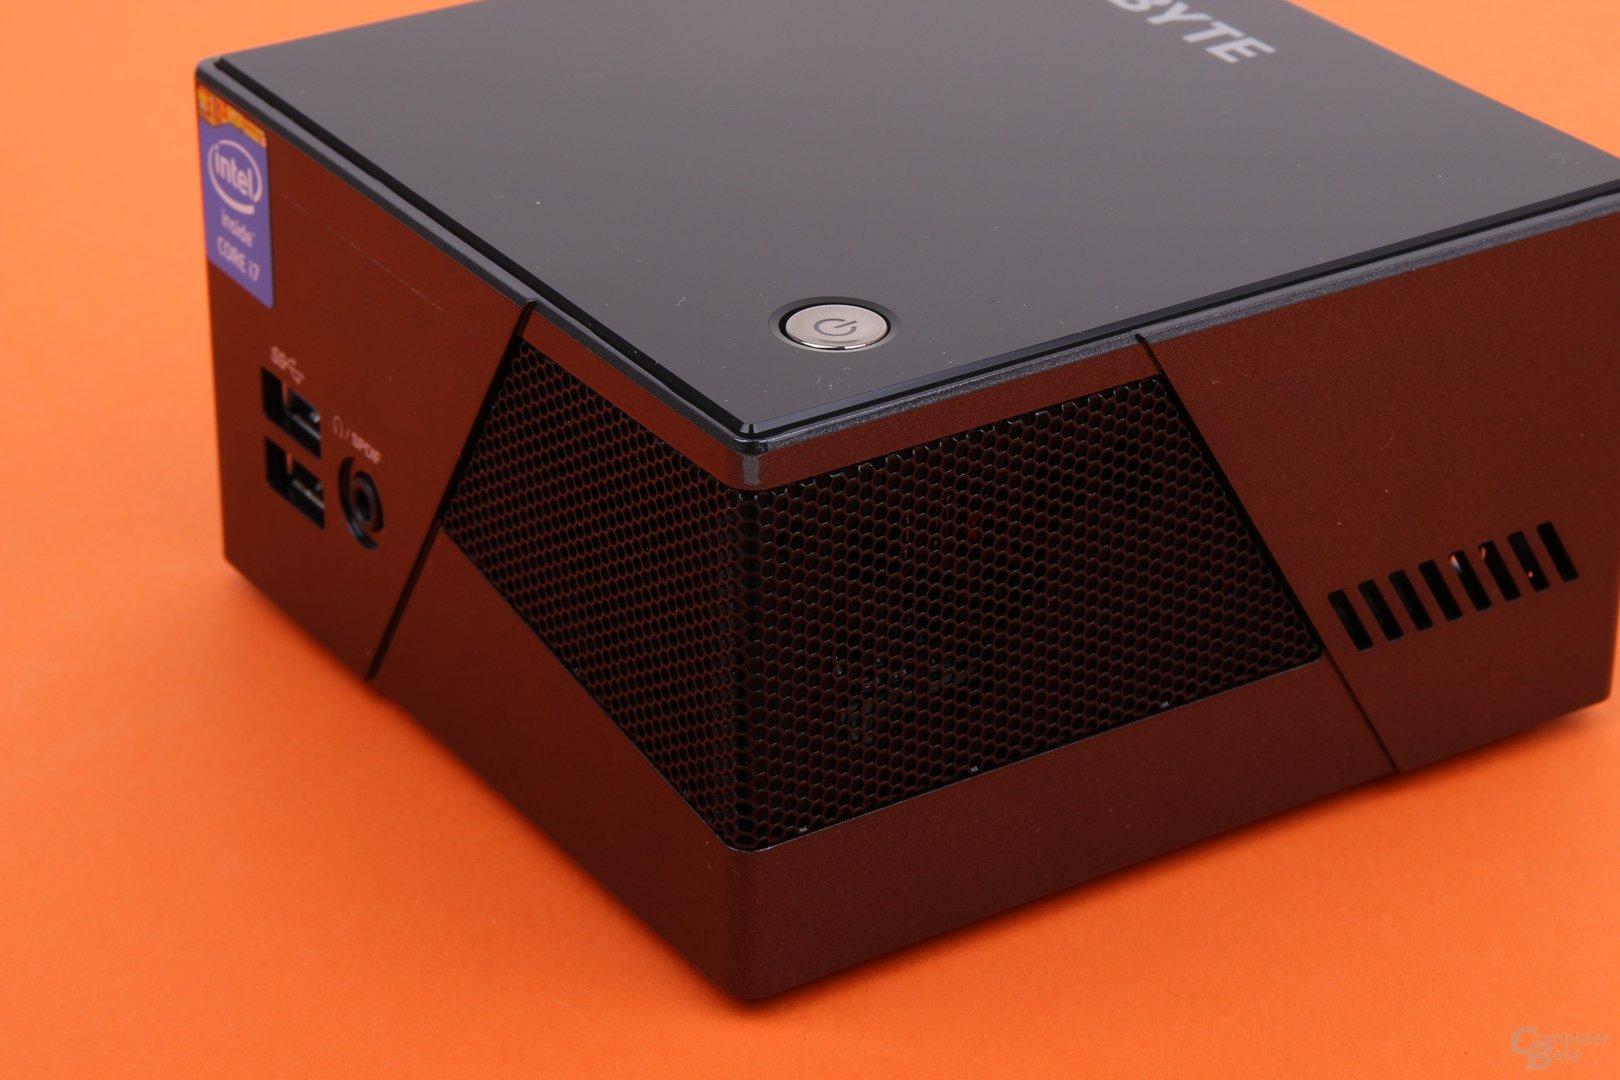 Gigabyte Brix Pro GB-BXi7-4770R